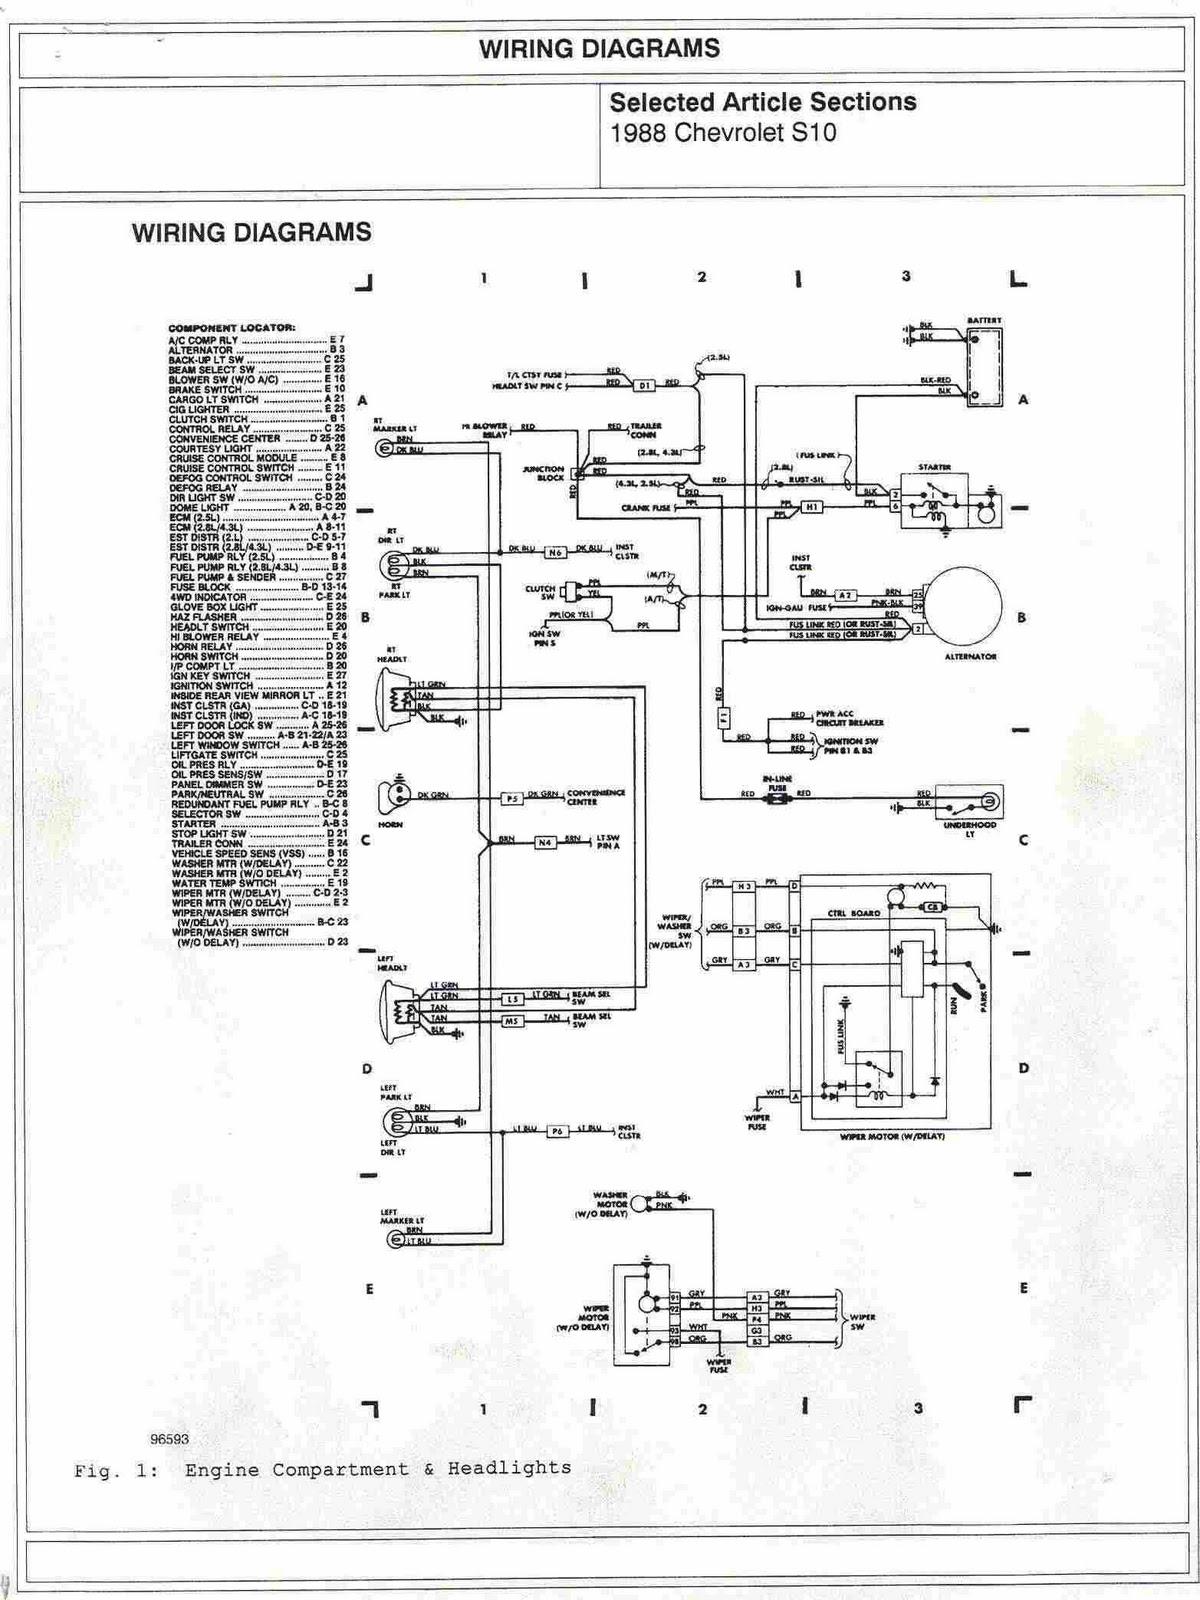 Amazing Cb450 Wiring Diagram Gallery - Wiring Diagram Ideas ...